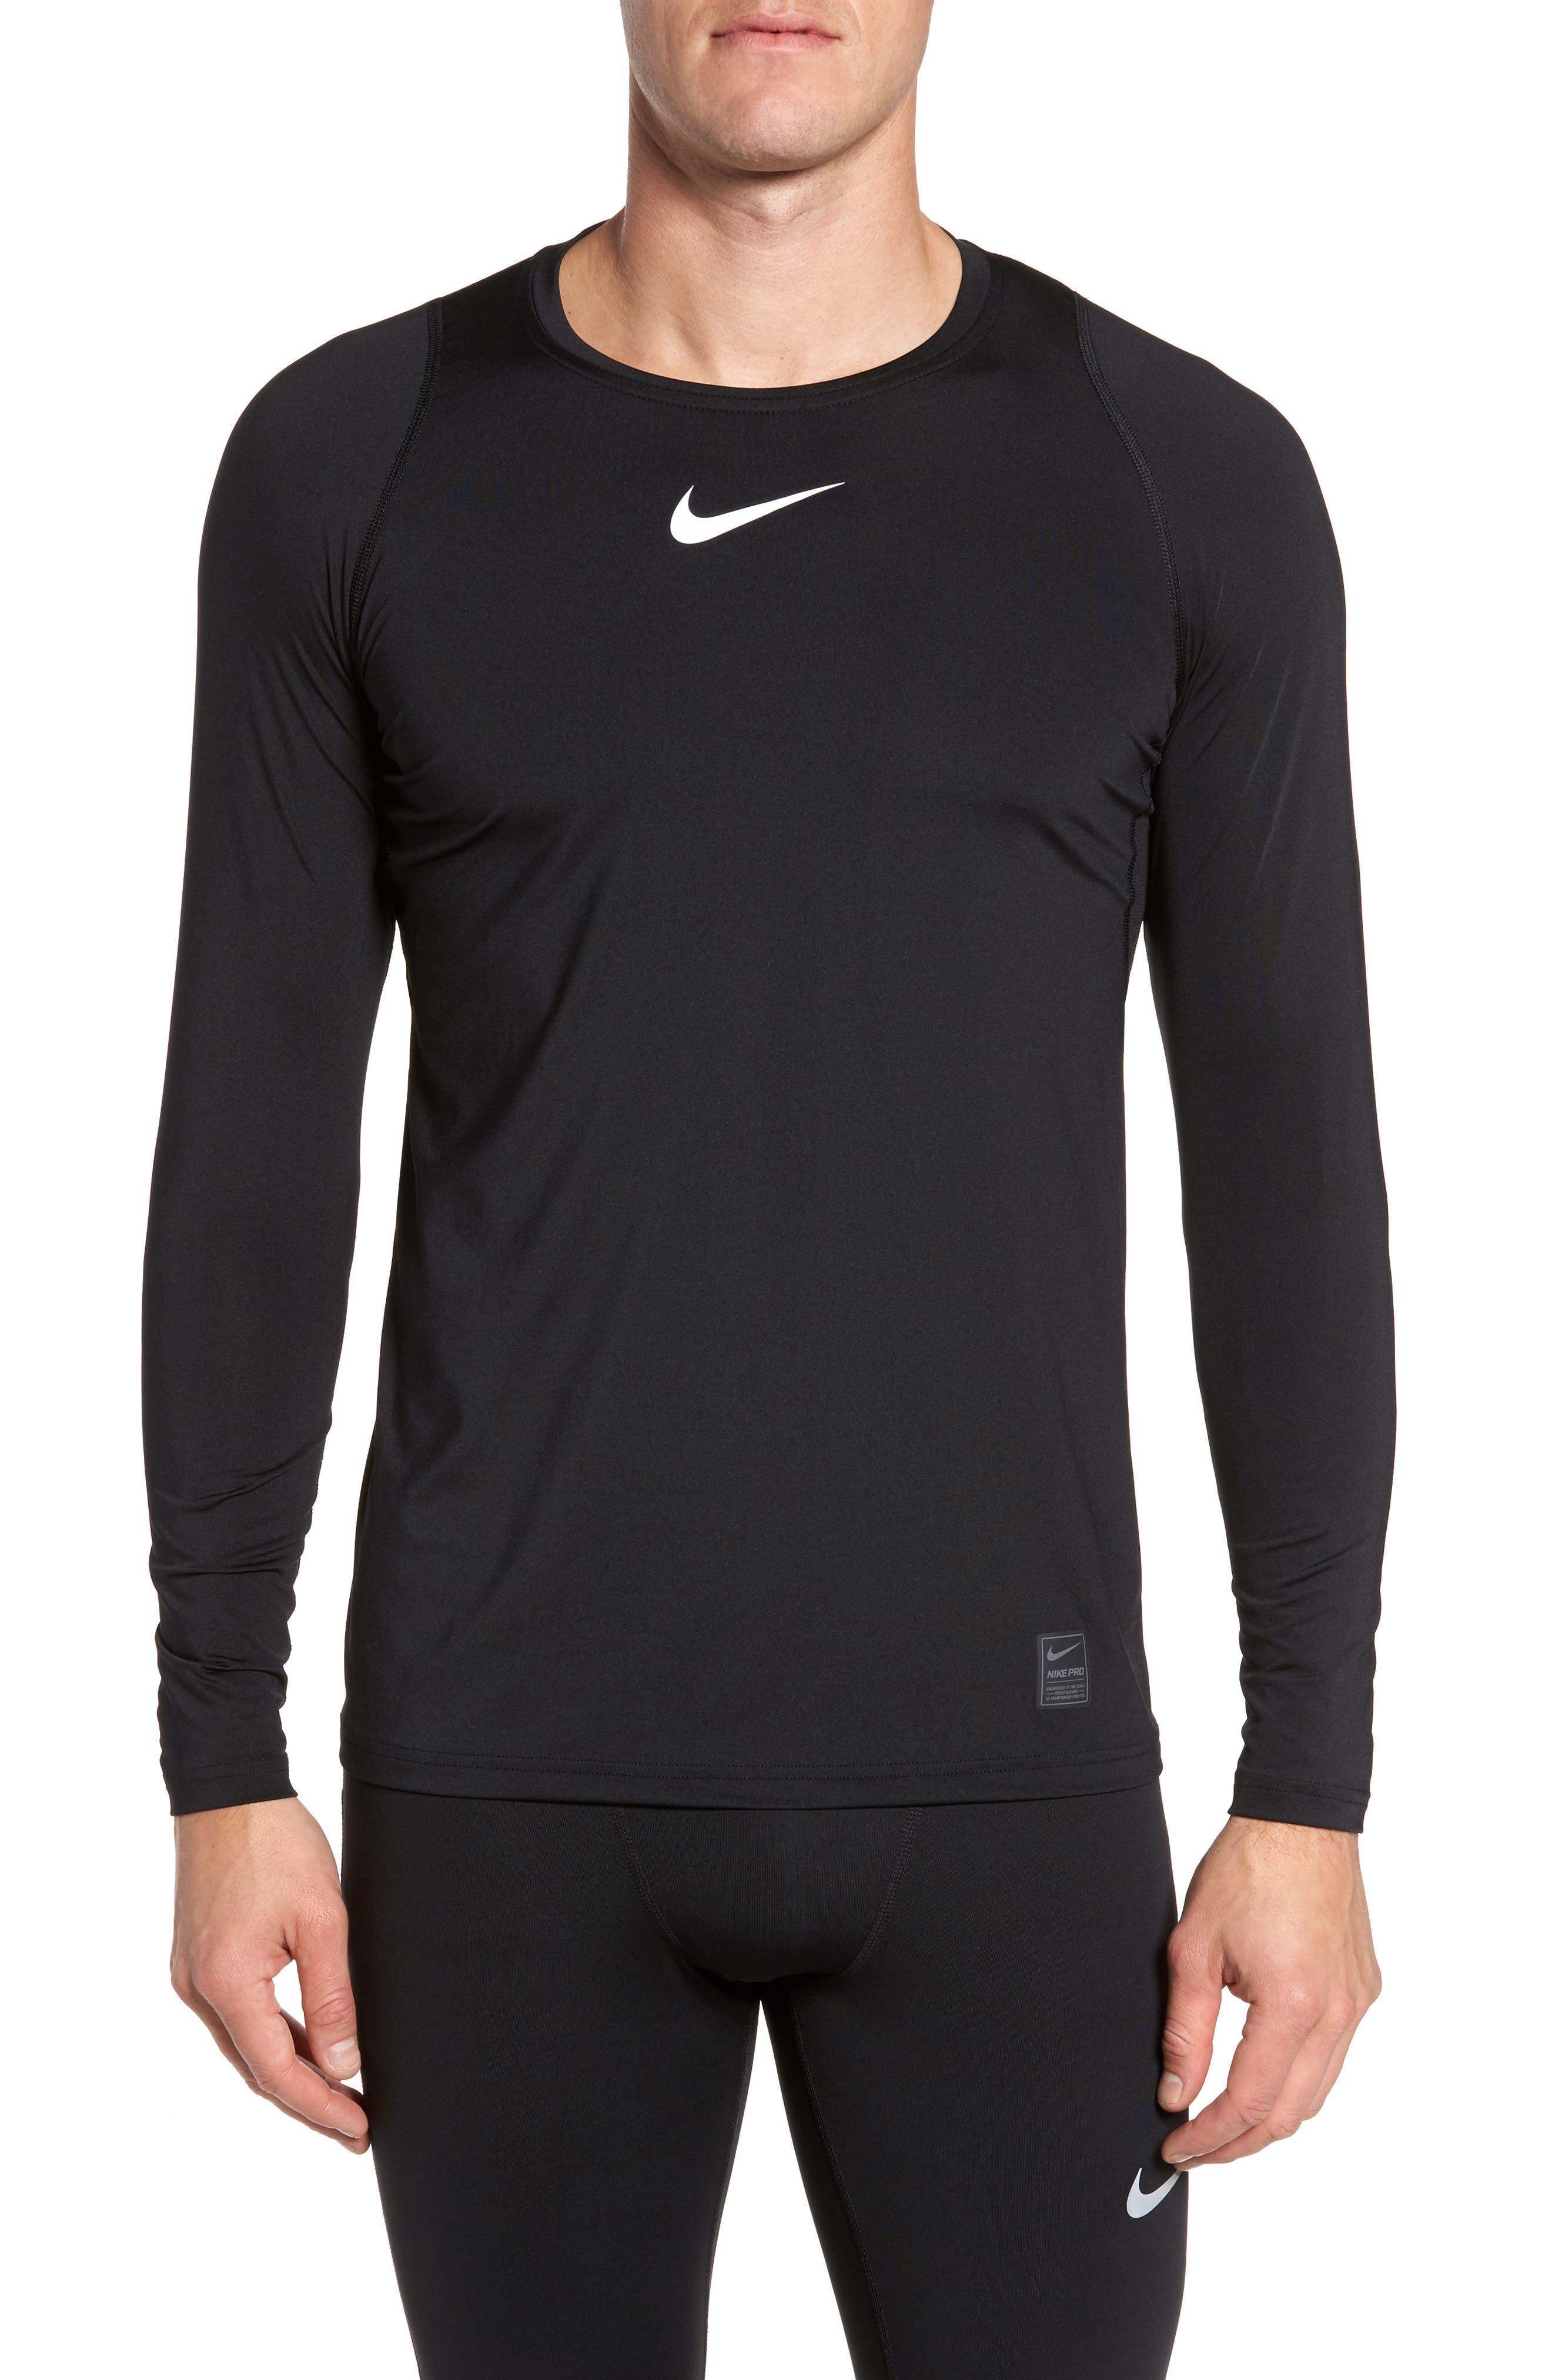 Pro Fitted Performance T-Shirt,                             Main thumbnail 1, color,                             BLACK/ WHITE/ WHITE